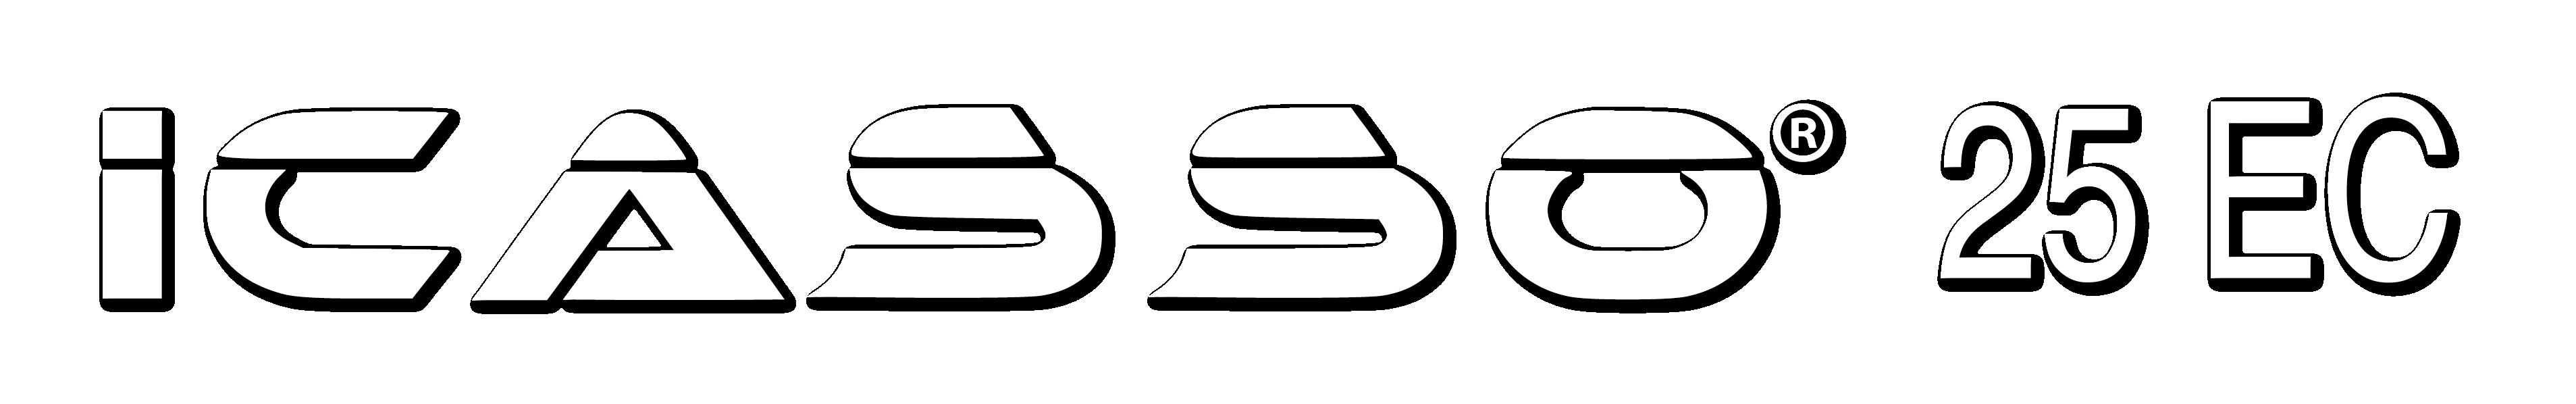 Icasso-01